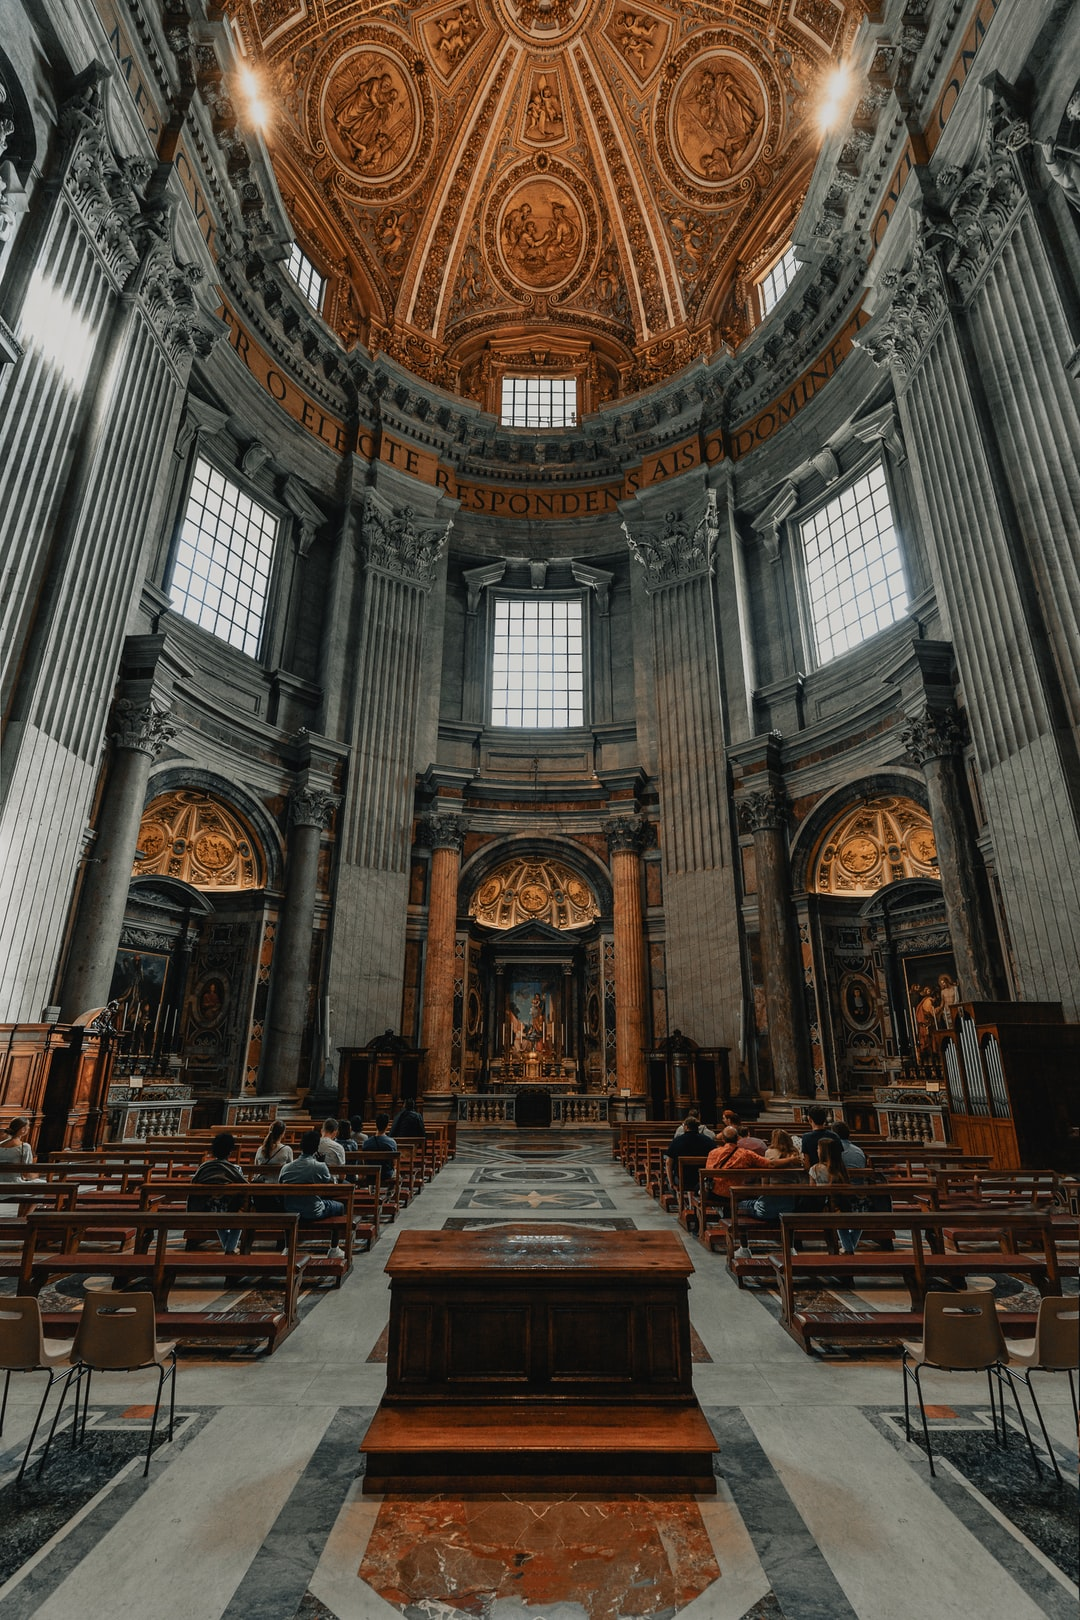 St. Peter's Basilica (1/3)